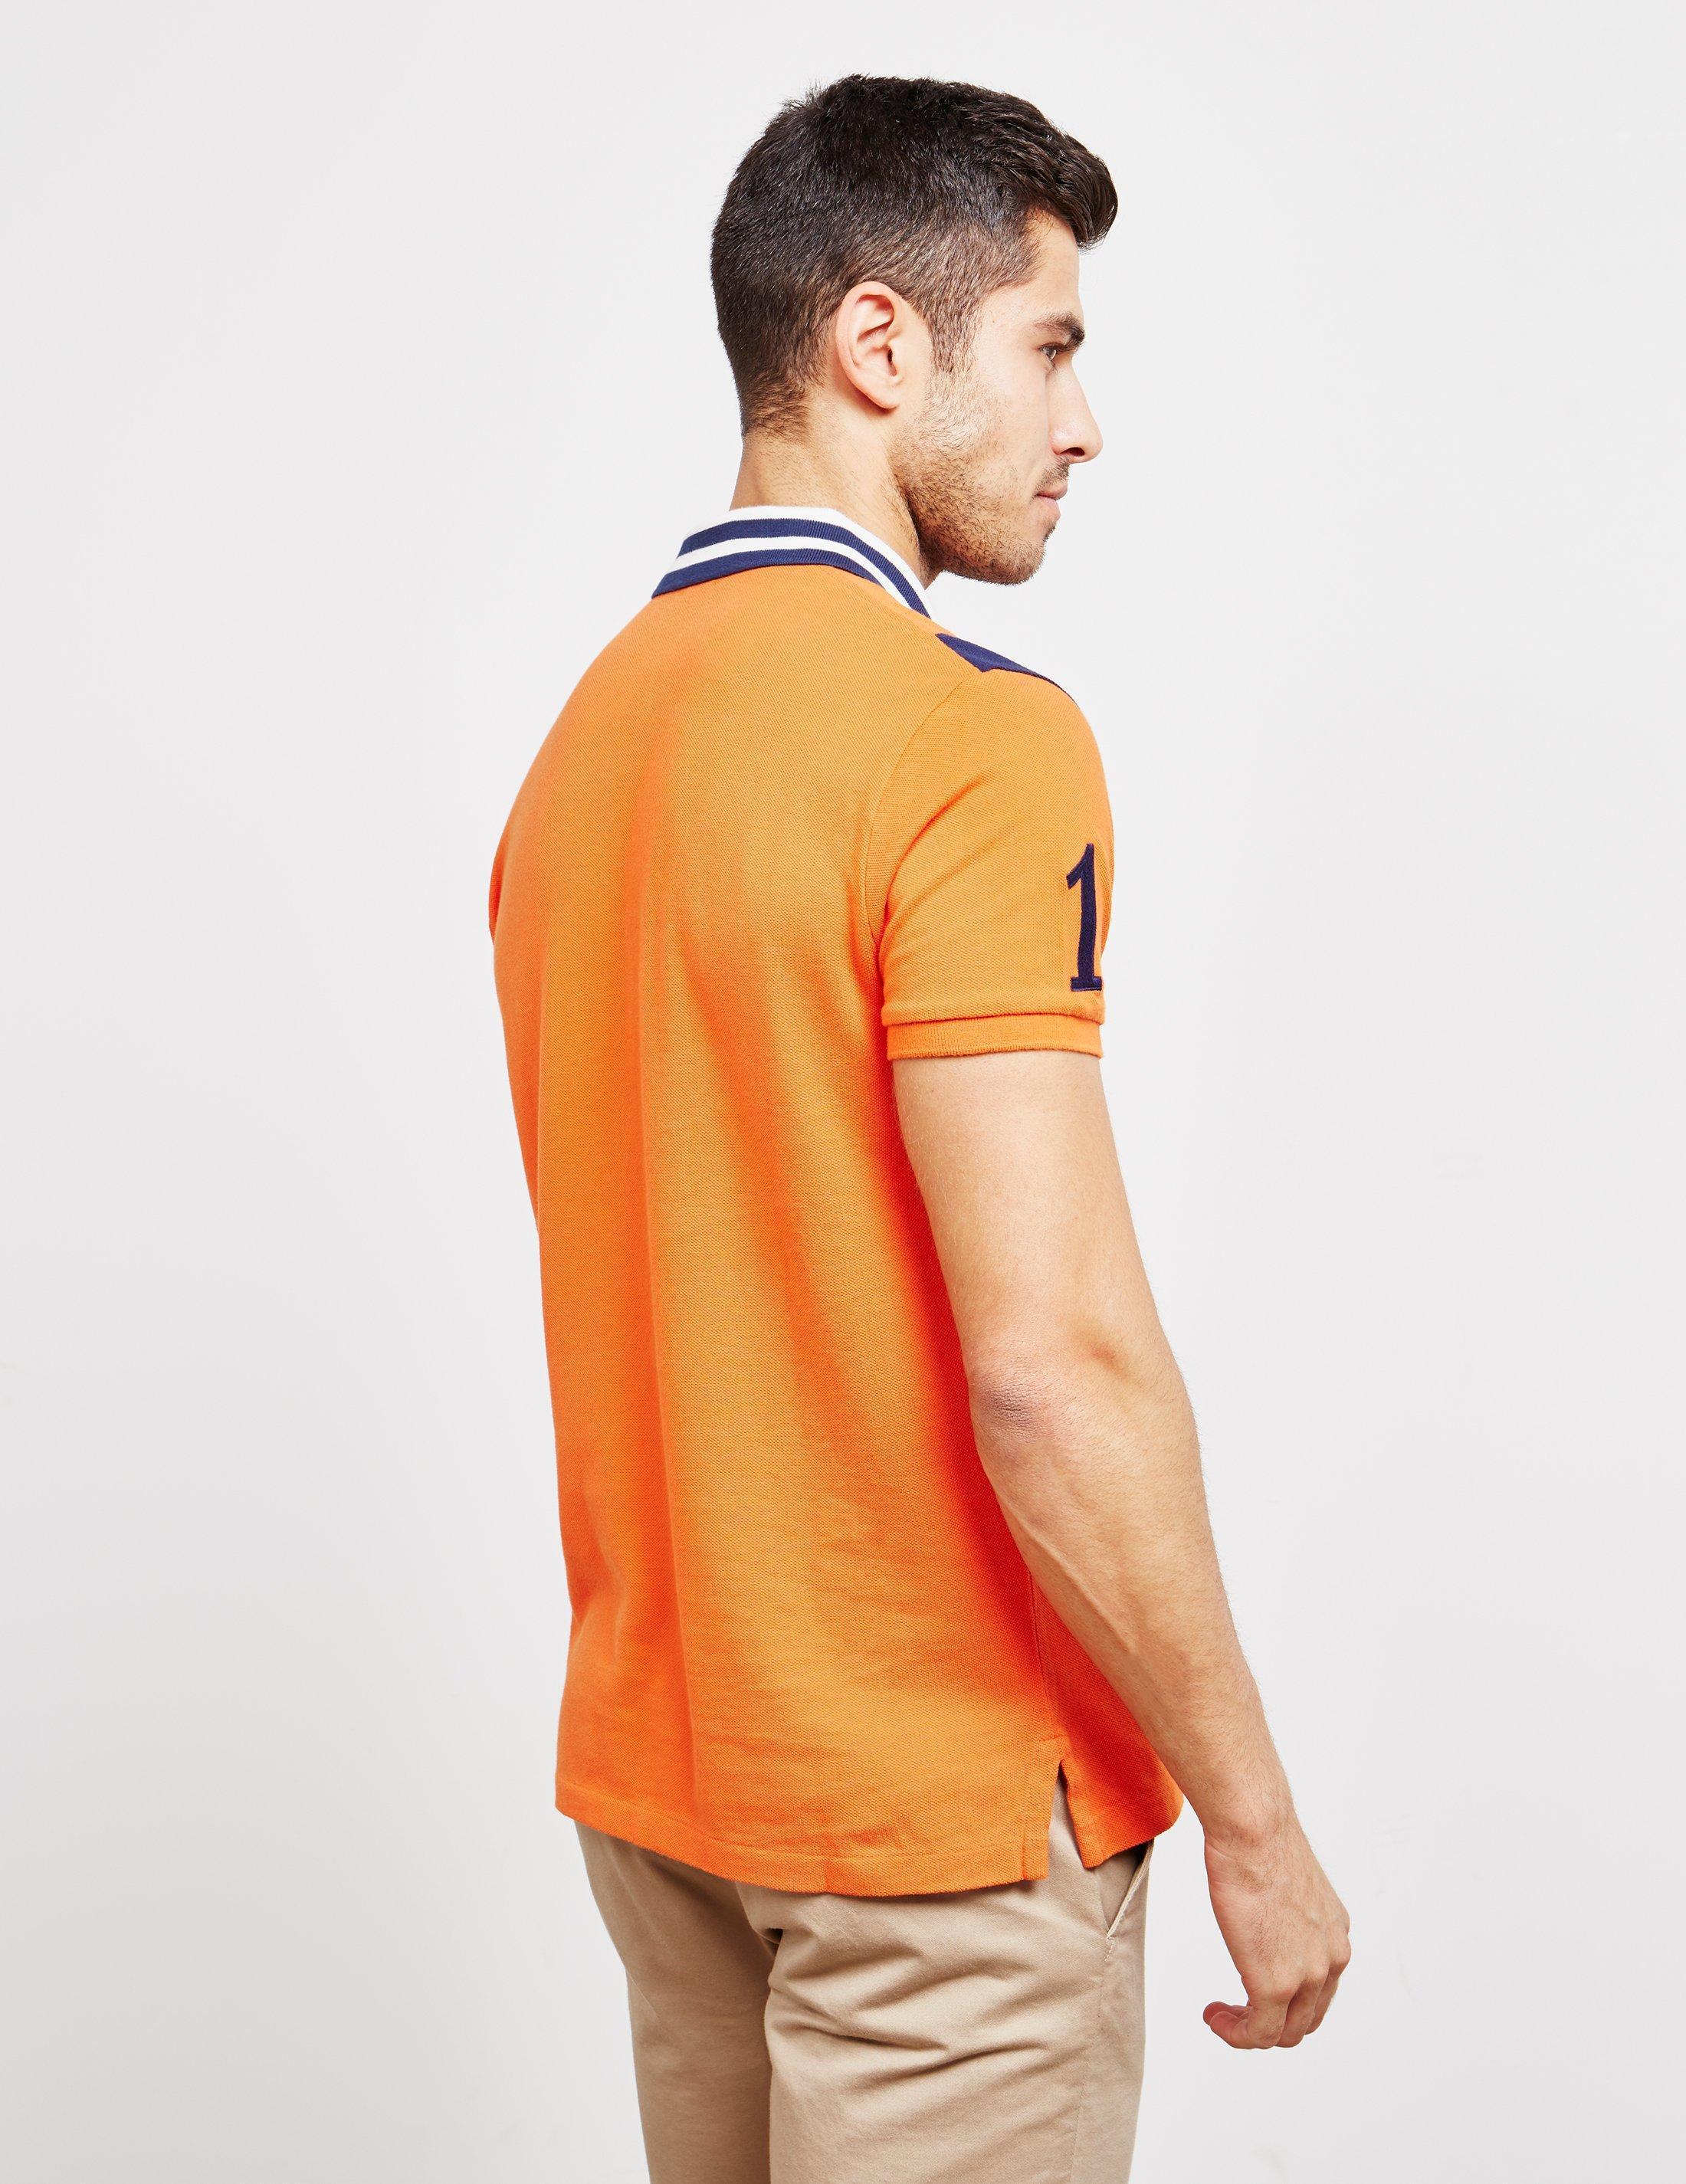 f7e60994 Polo Ralph Lauren - Embroidered Crest Short Sleeve Polo Shirt Orange for Men  - Lyst. View fullscreen